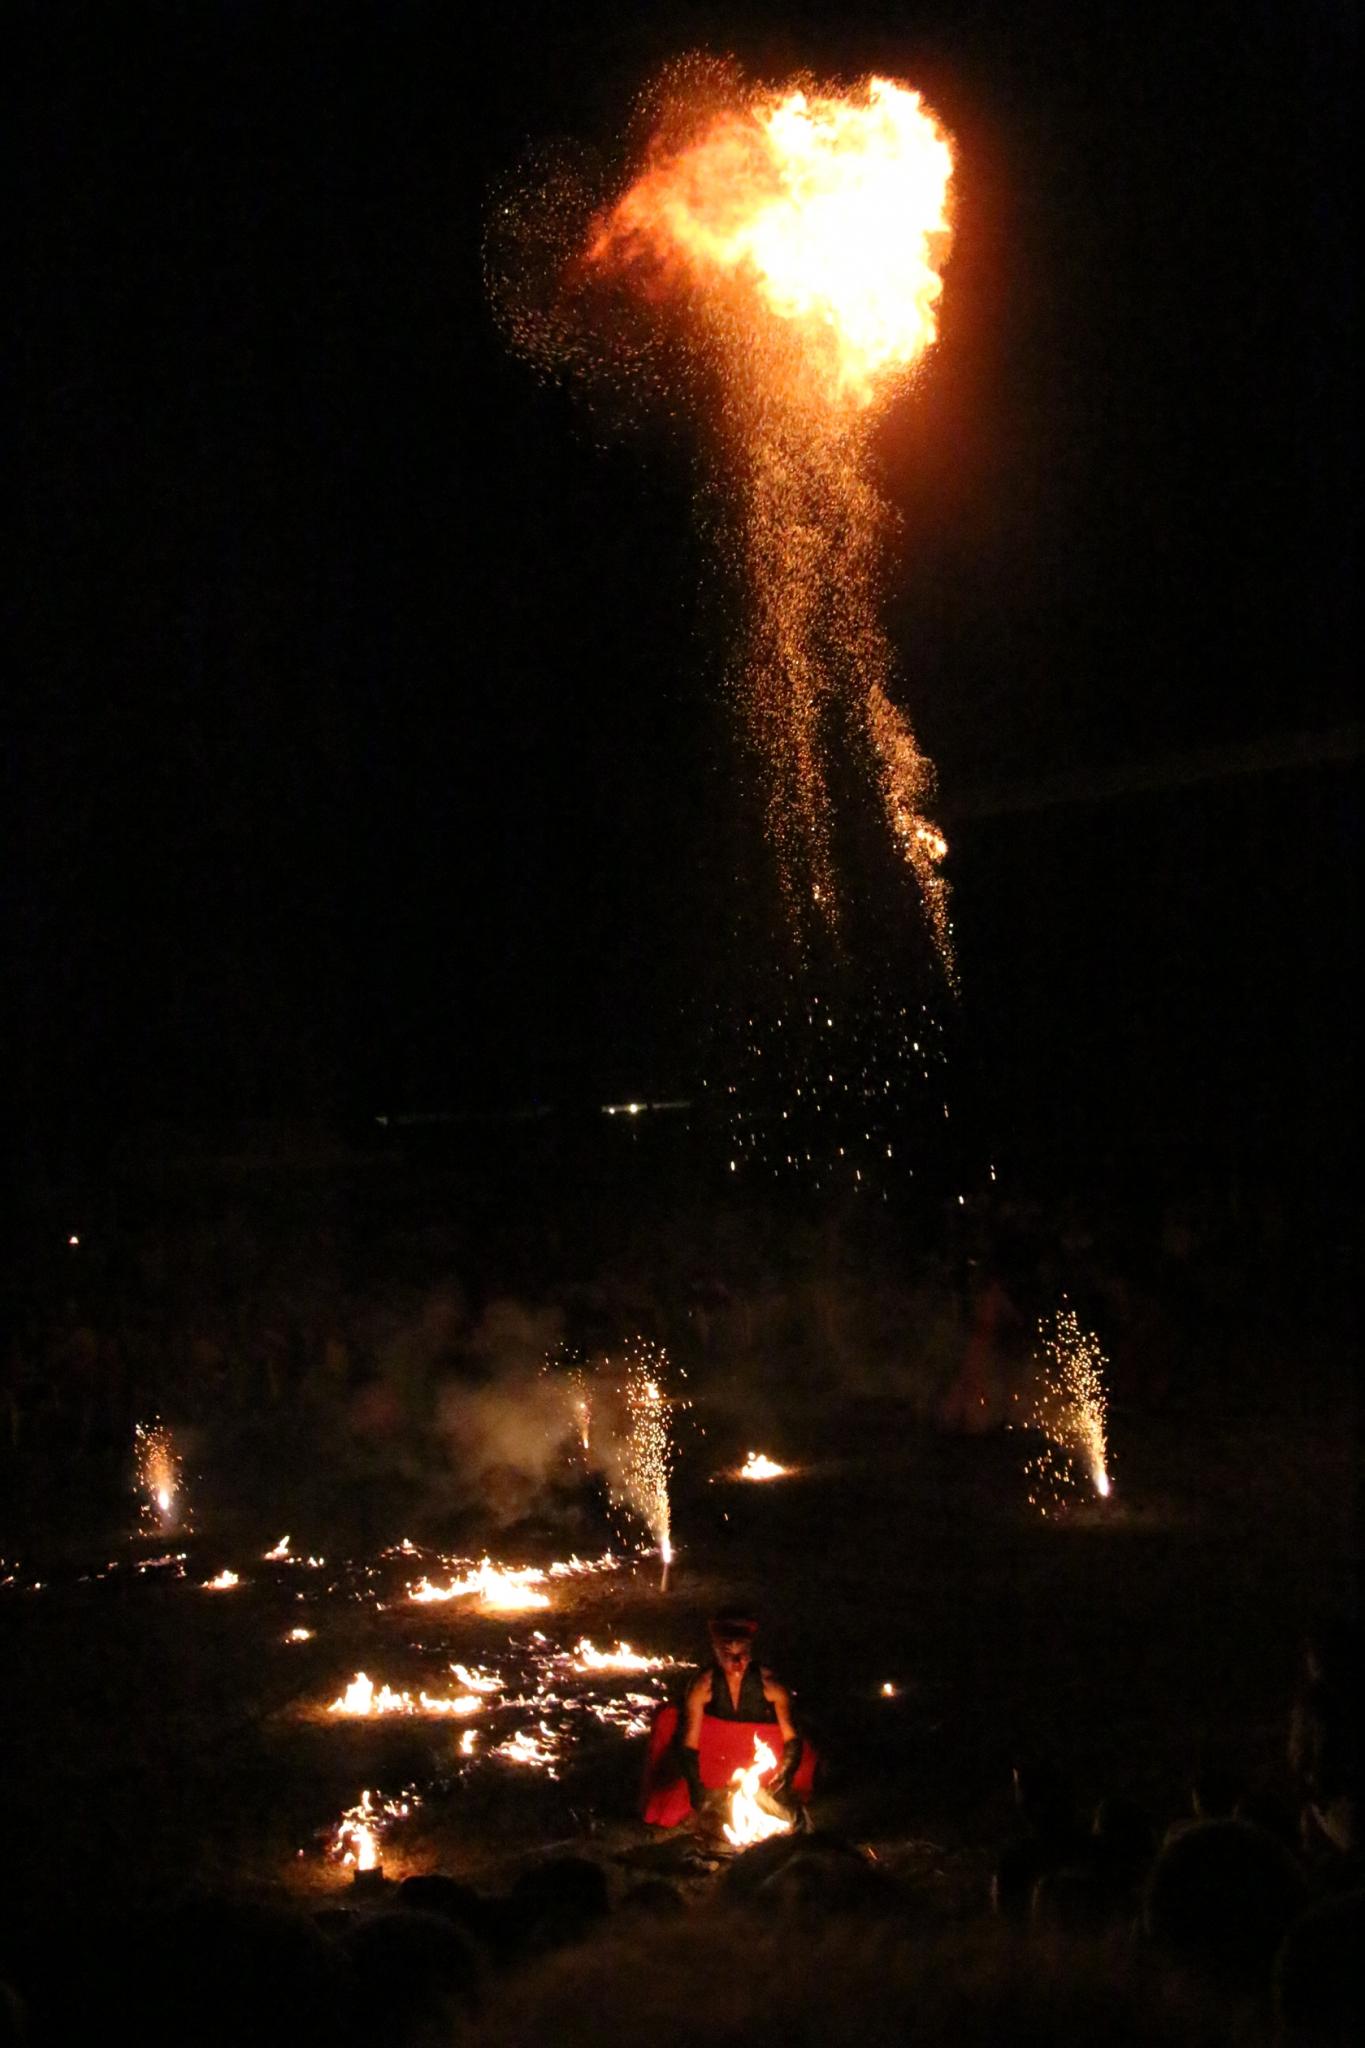 BORTOLUZZI Claude - Expo 2017 - Papier 1 - Allumez le feu